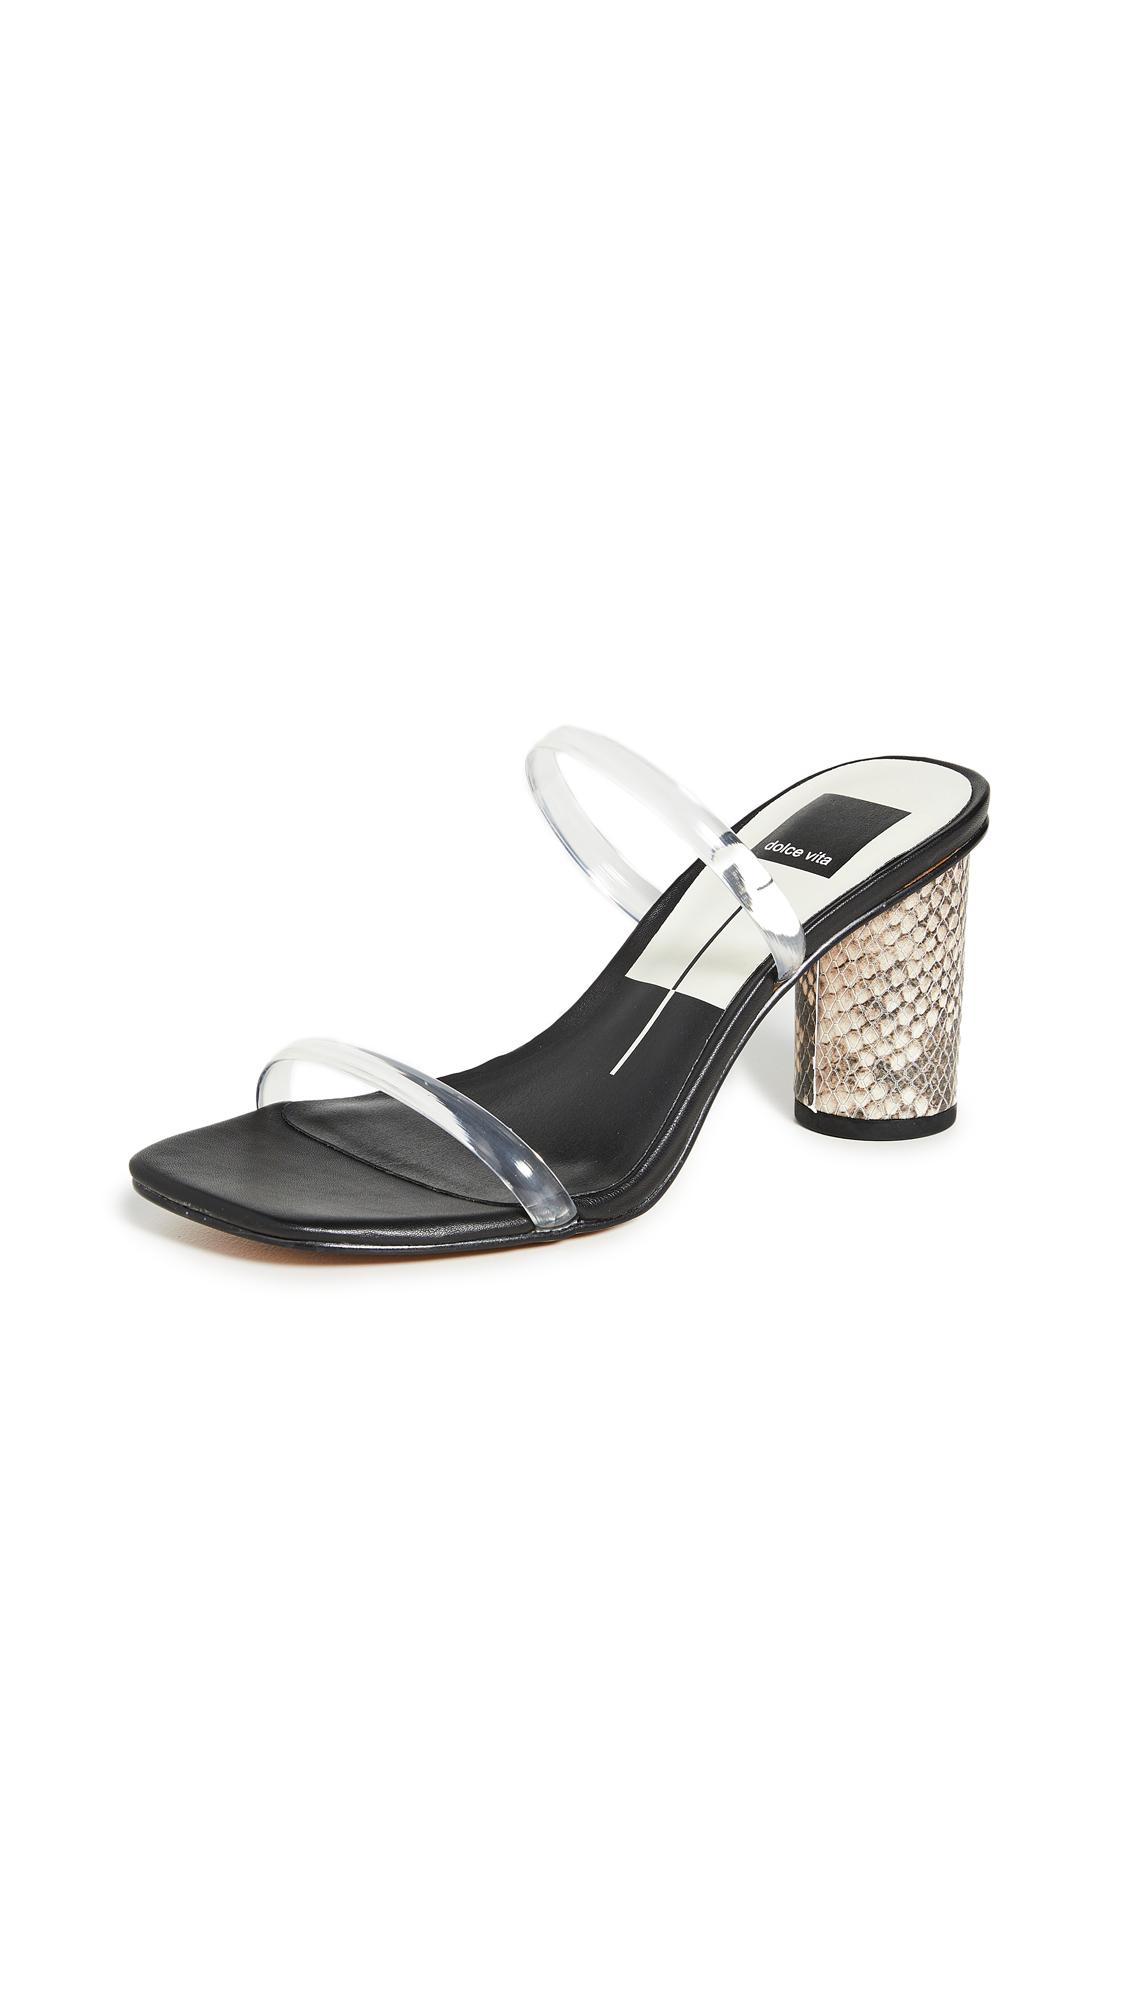 Buy Dolce Vita Noles Vinyl Slide Sandals online, shop Dolce Vita